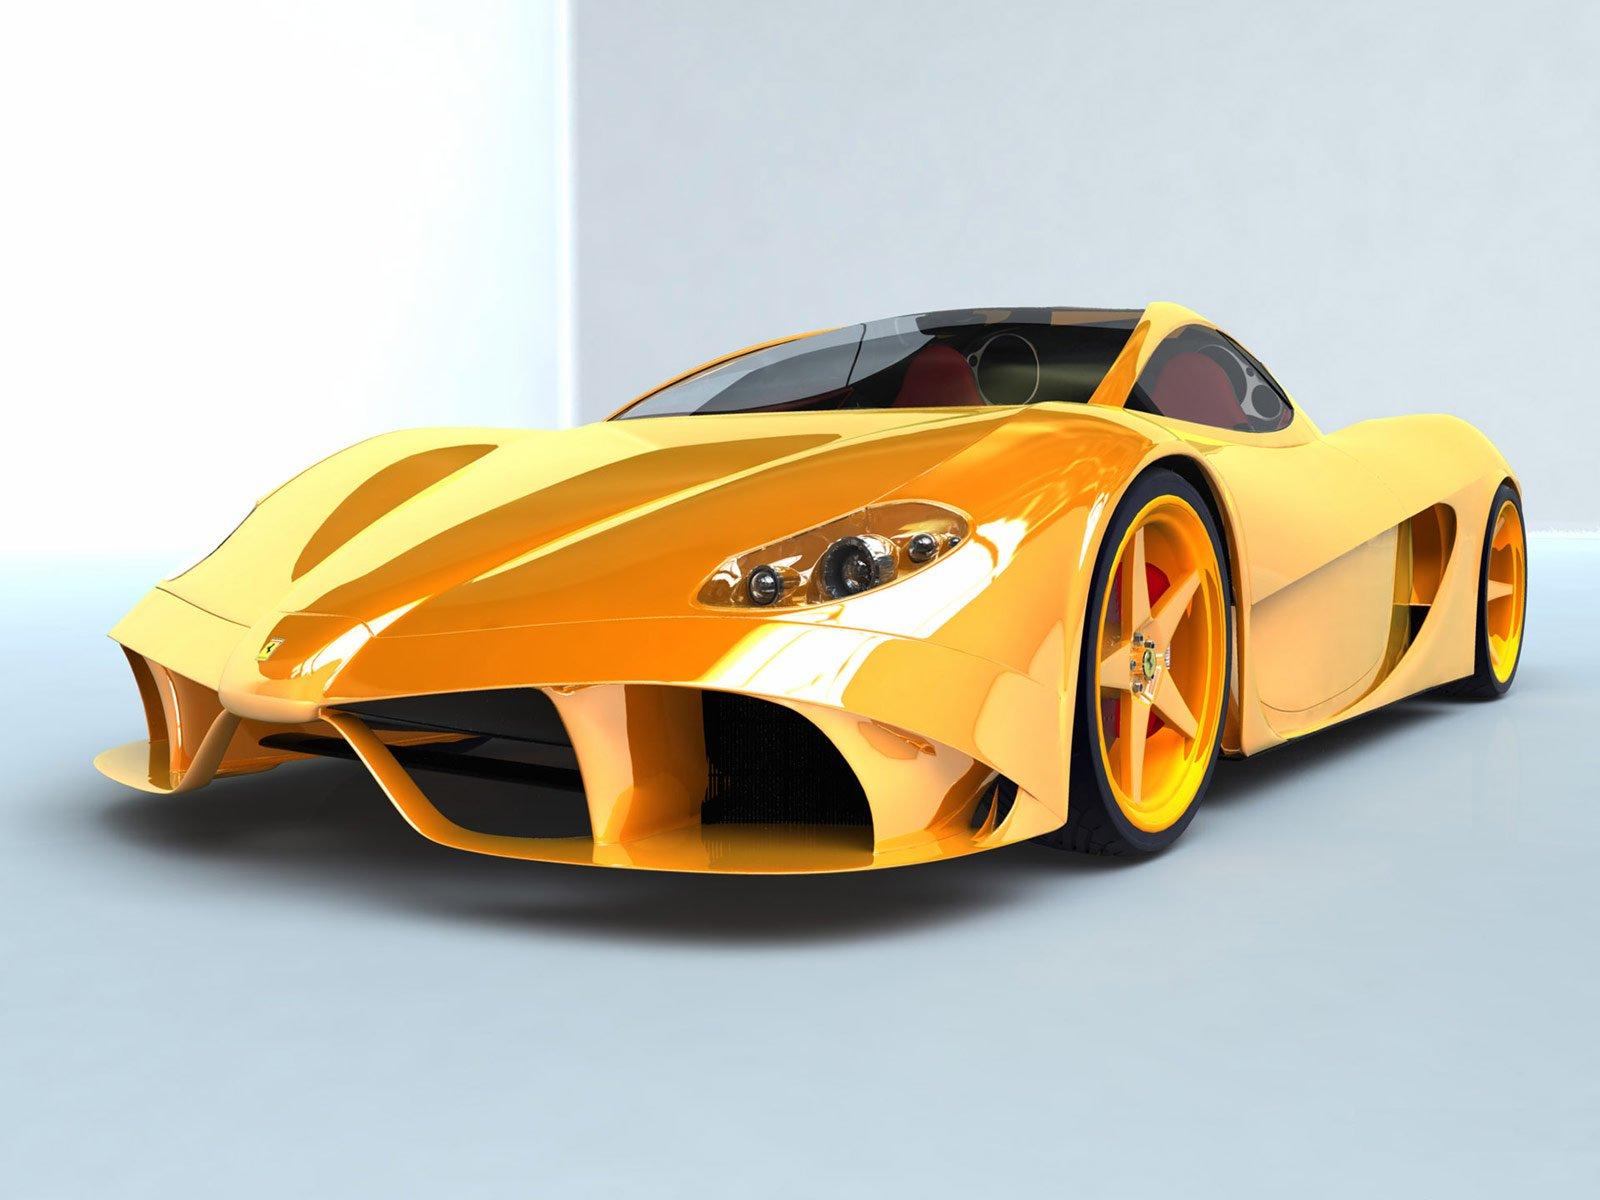 49 Speedy Car Wallpapers For Desktop Download 1600x1200